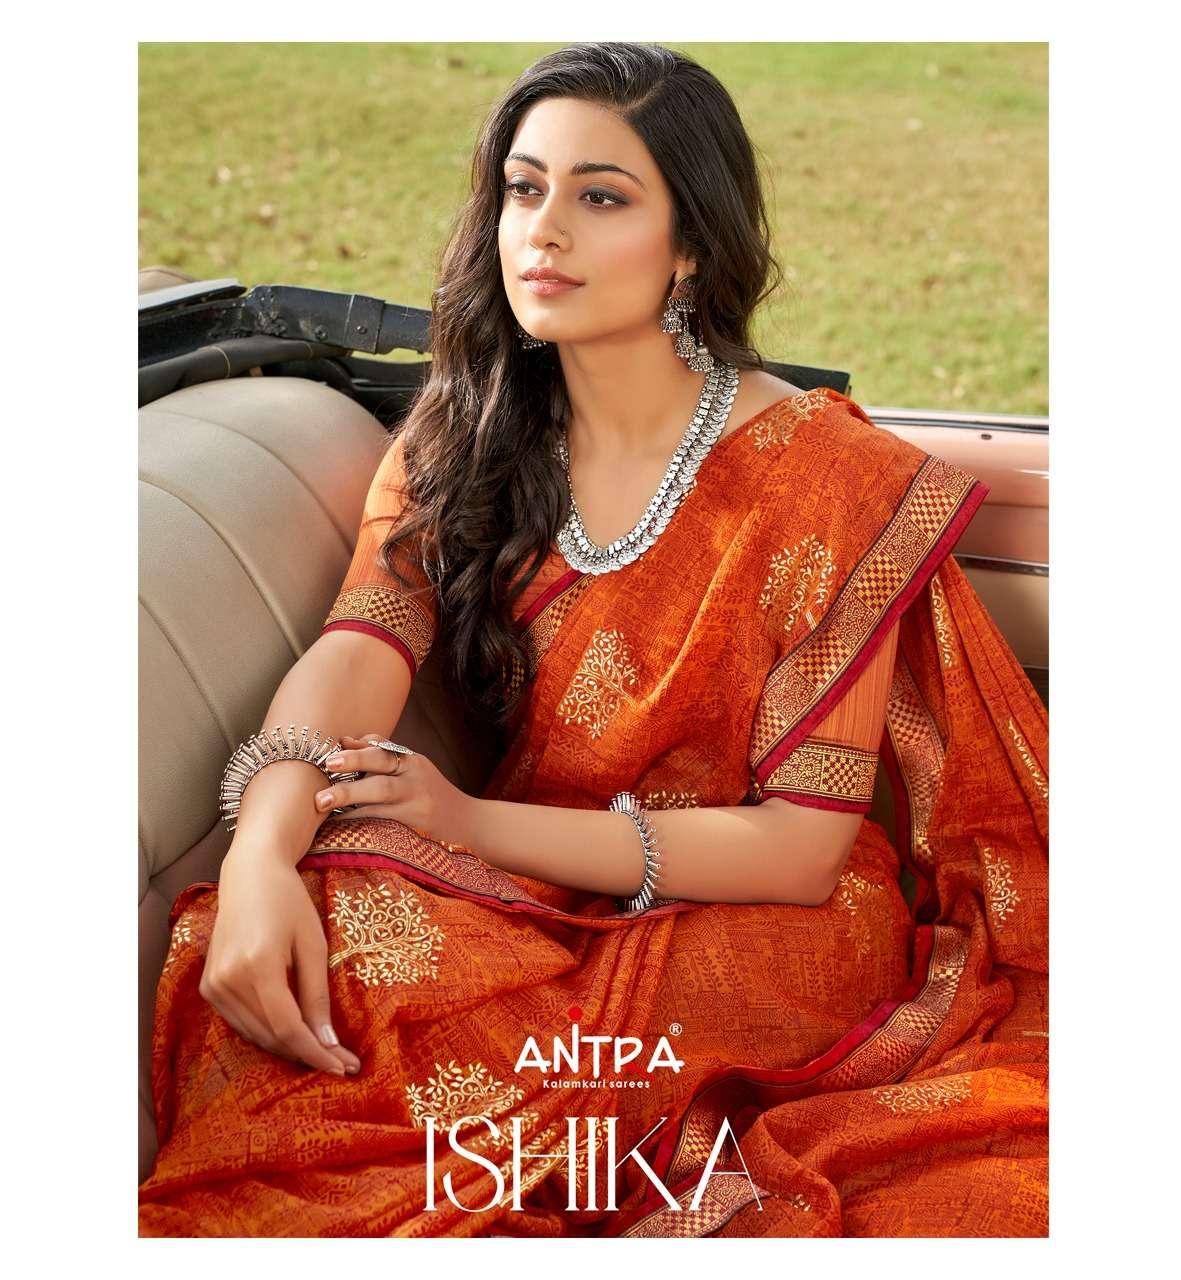 Antra Ishika Vol 1 fancy Bandhani Print Chiffon Saree New Catalog Supplier